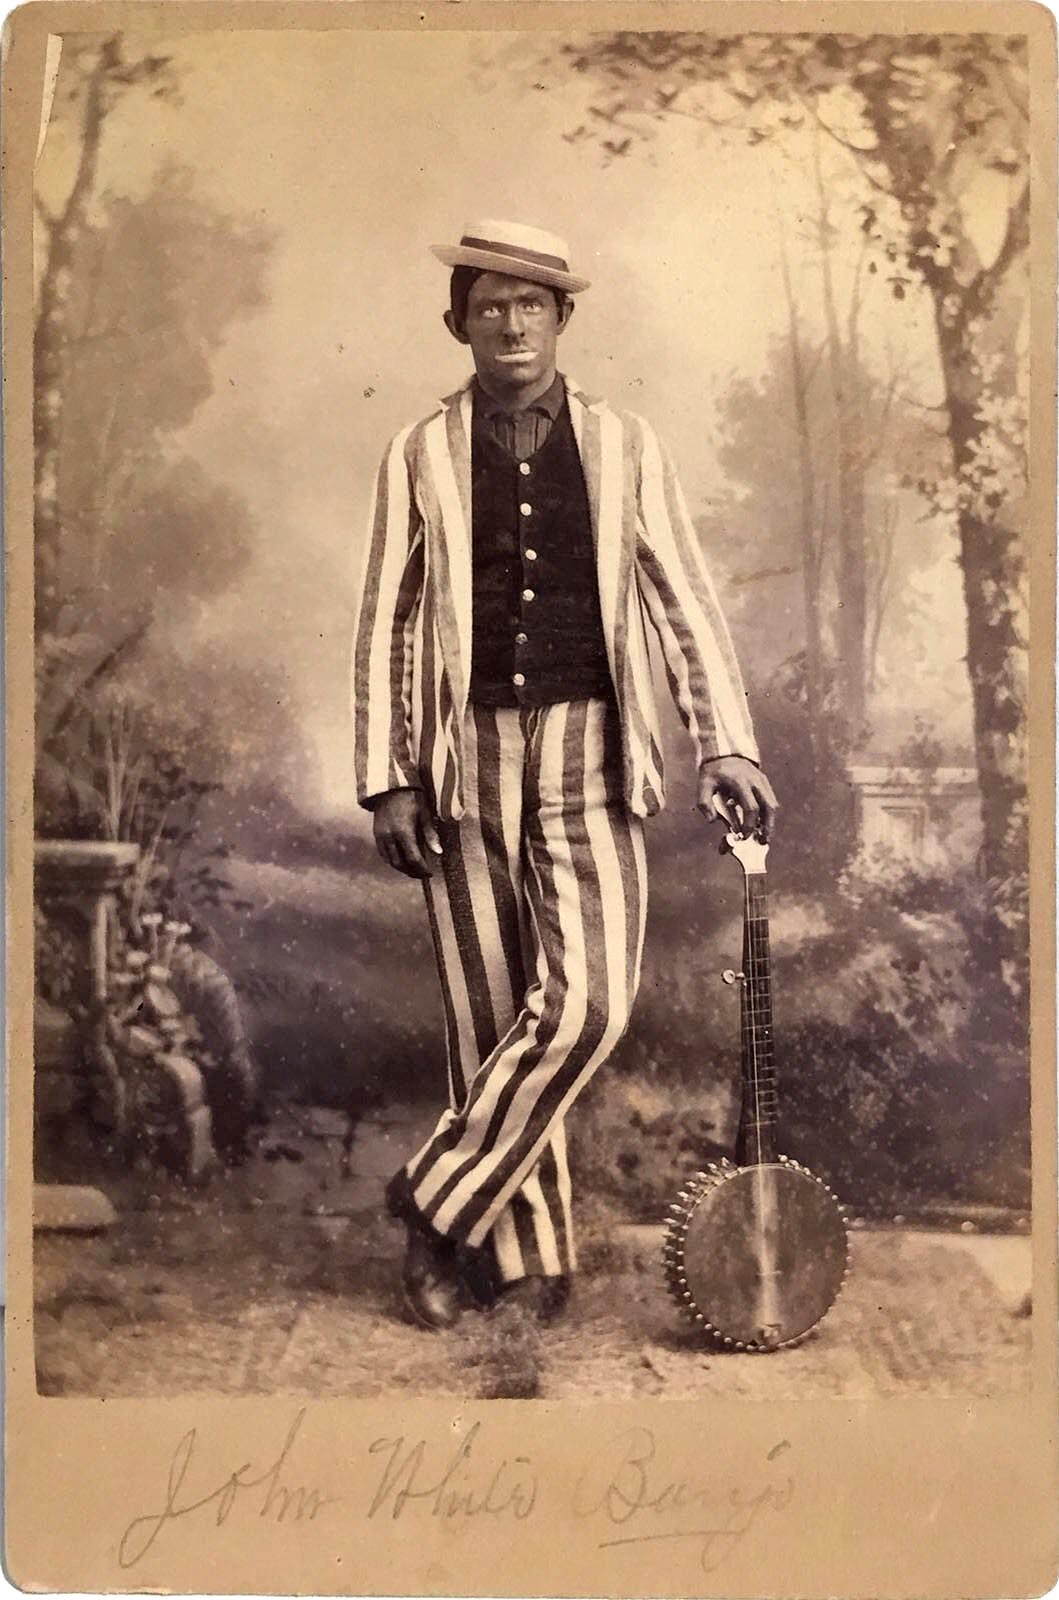 File:Blackface minstrel John White with Banjo c1890.png - Wikimedia Commons